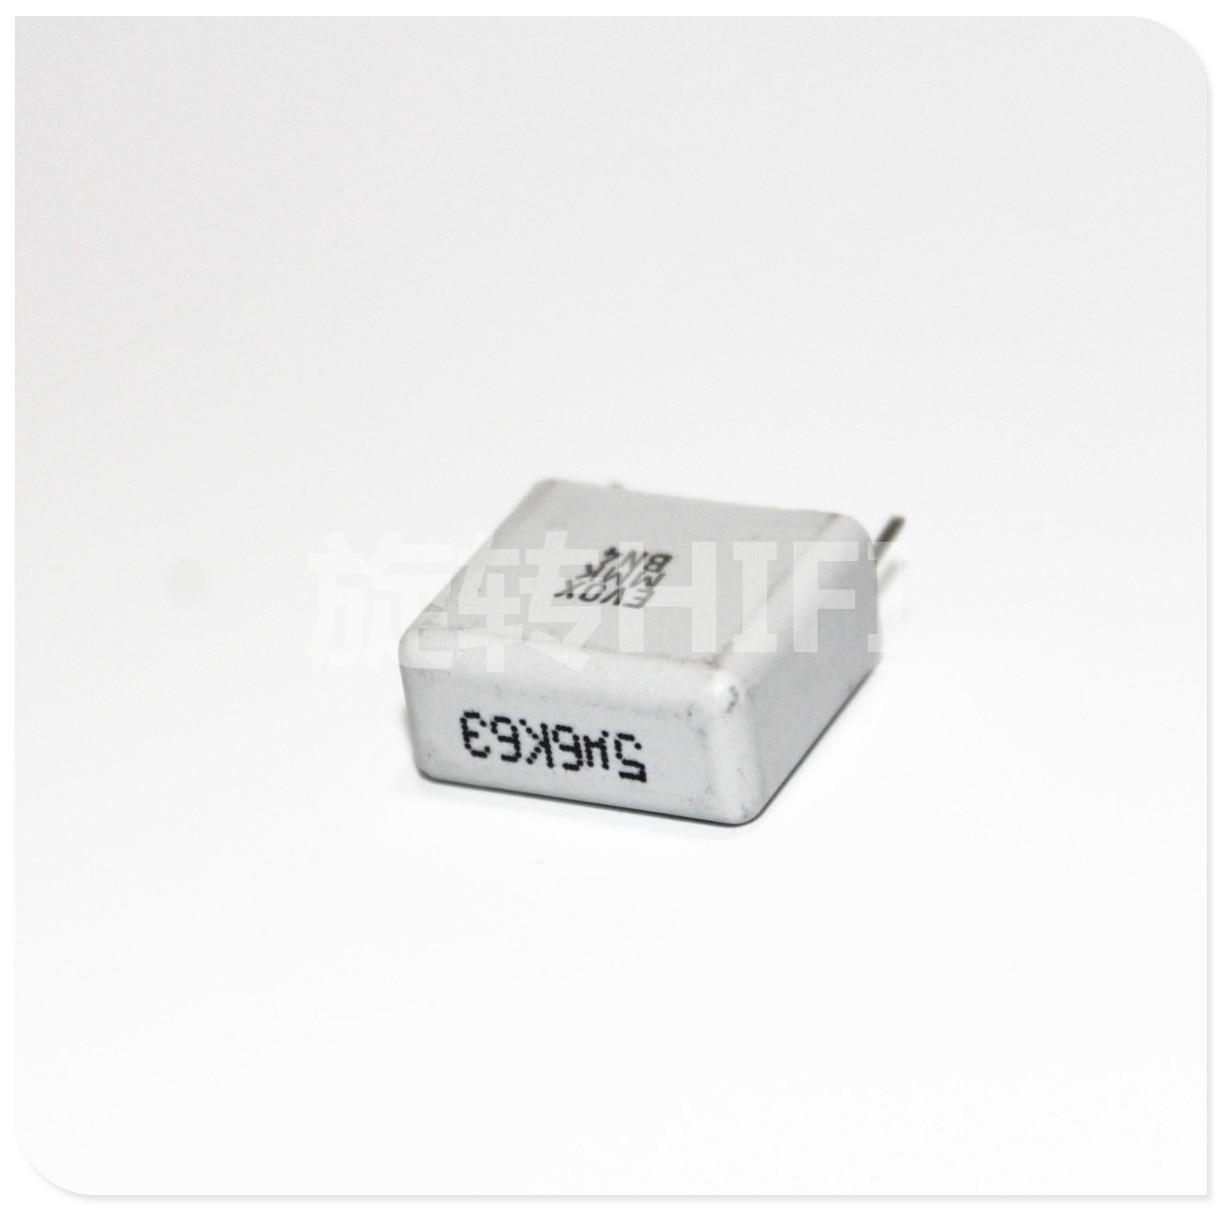 20pcs Evox Mmk15 5u6 56uf 565 63v New Fever Audio Film Coupling Capasitor Mkm 100nf 104 Capacitor P15 Free Shipping